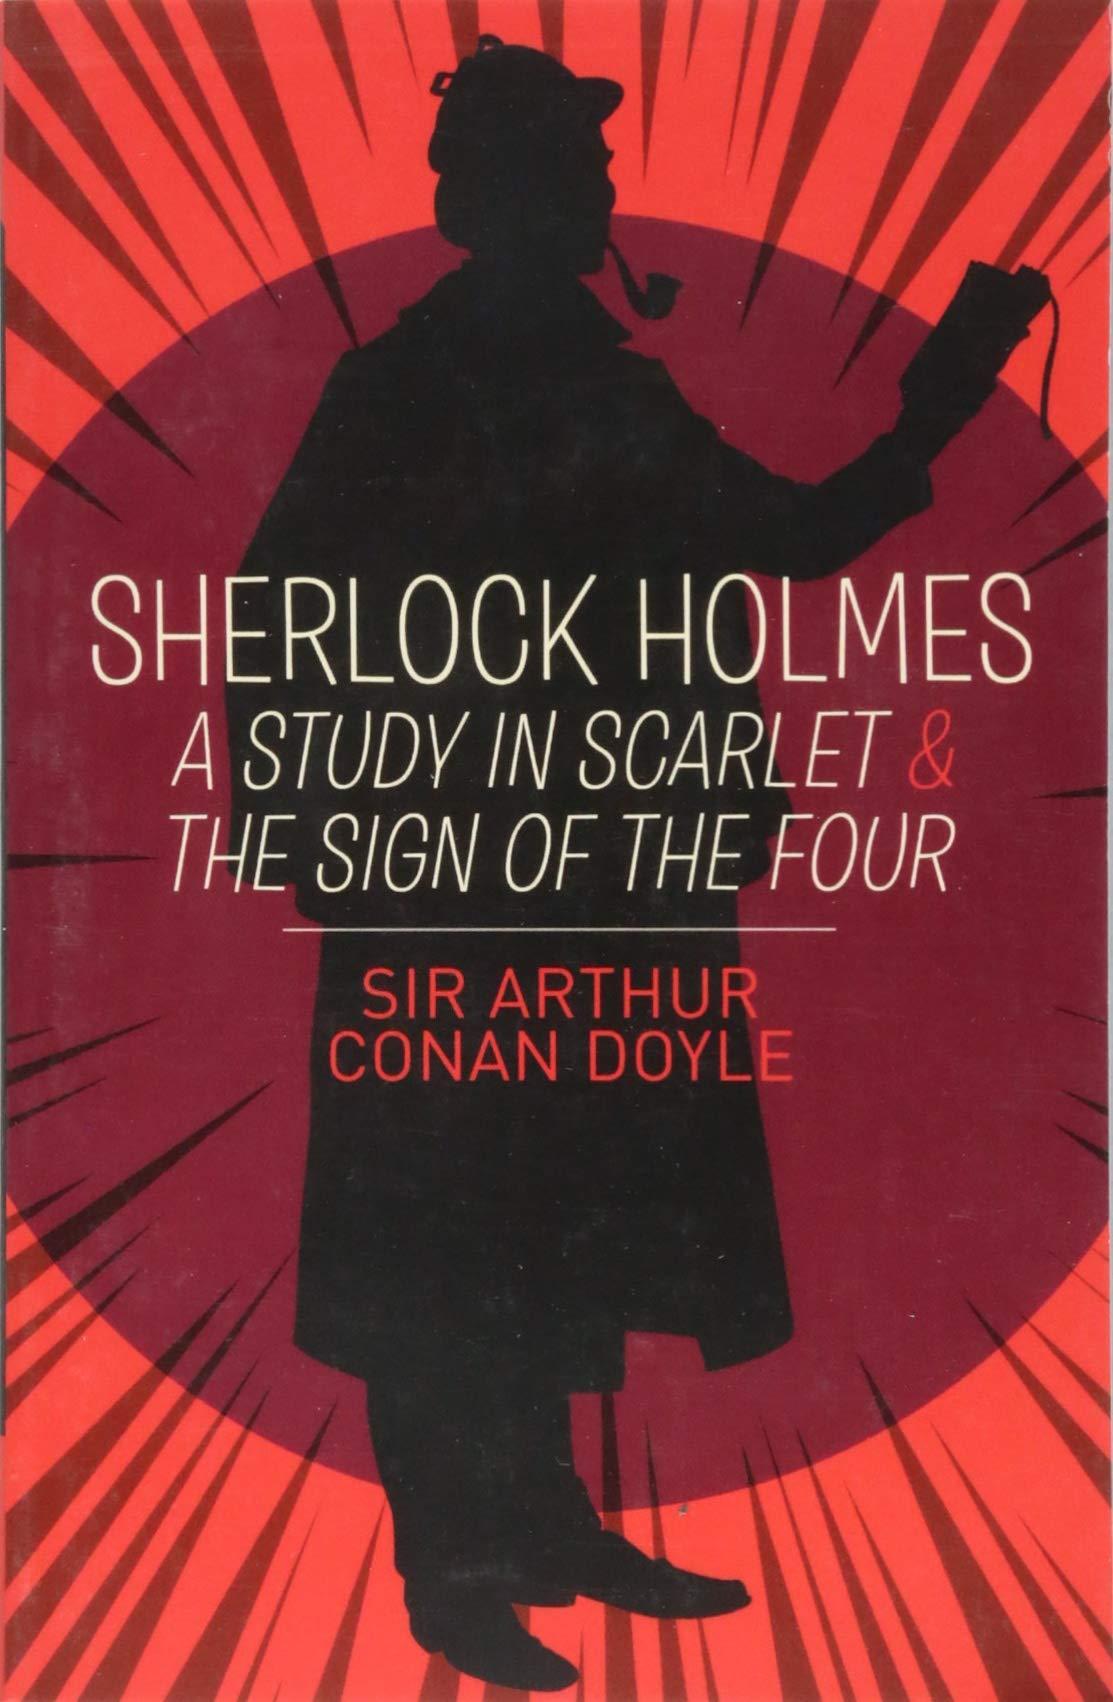 A Study In Scarlet The Sign Of The Four Sir Arthur Conan Doyle 9781788884082 Amazon Com Books